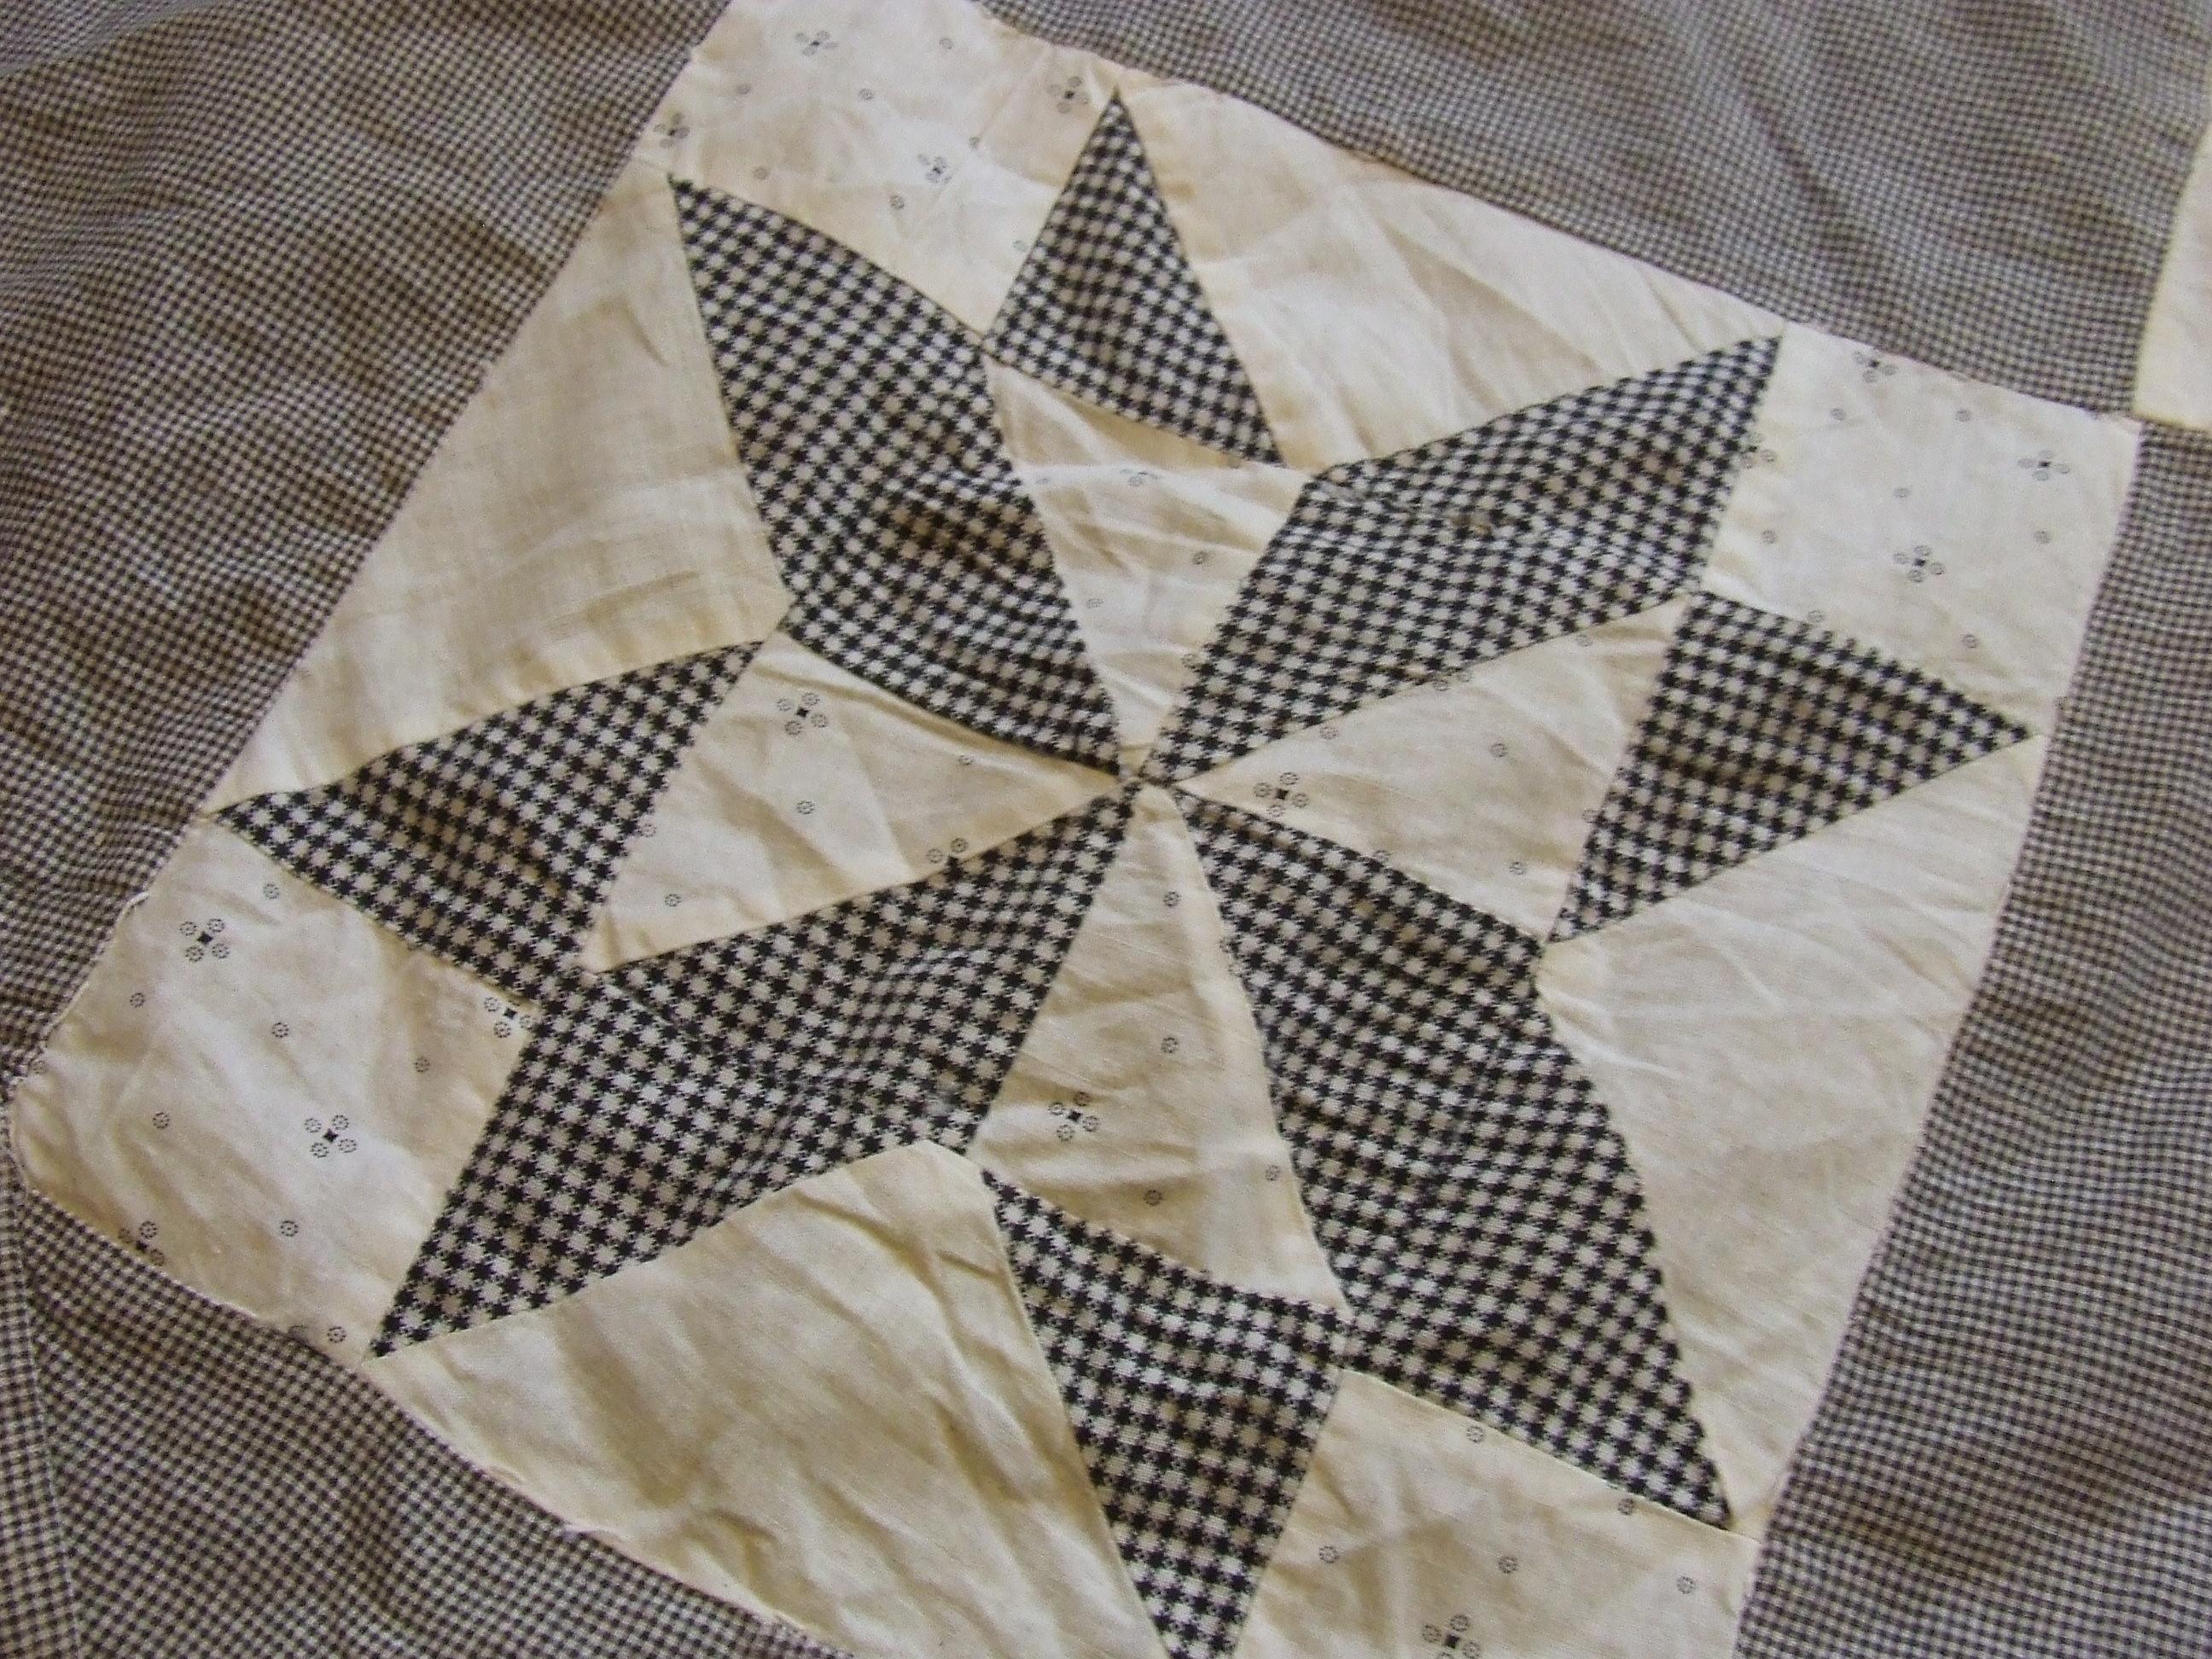 More Vintage Quilt Tops | Tim Latimer - Quilts etc : vintage quilt tops - Adamdwight.com